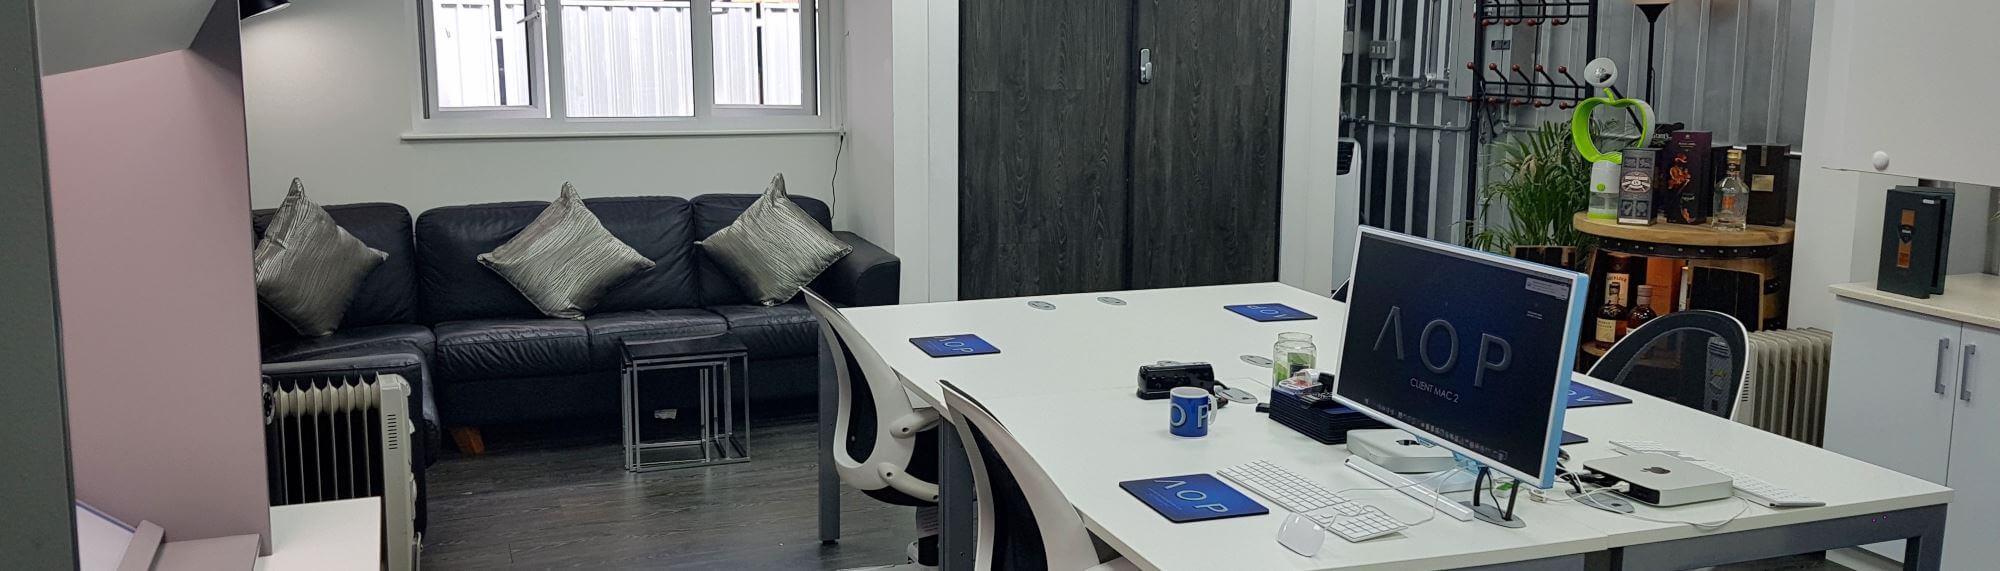 Client Rooms